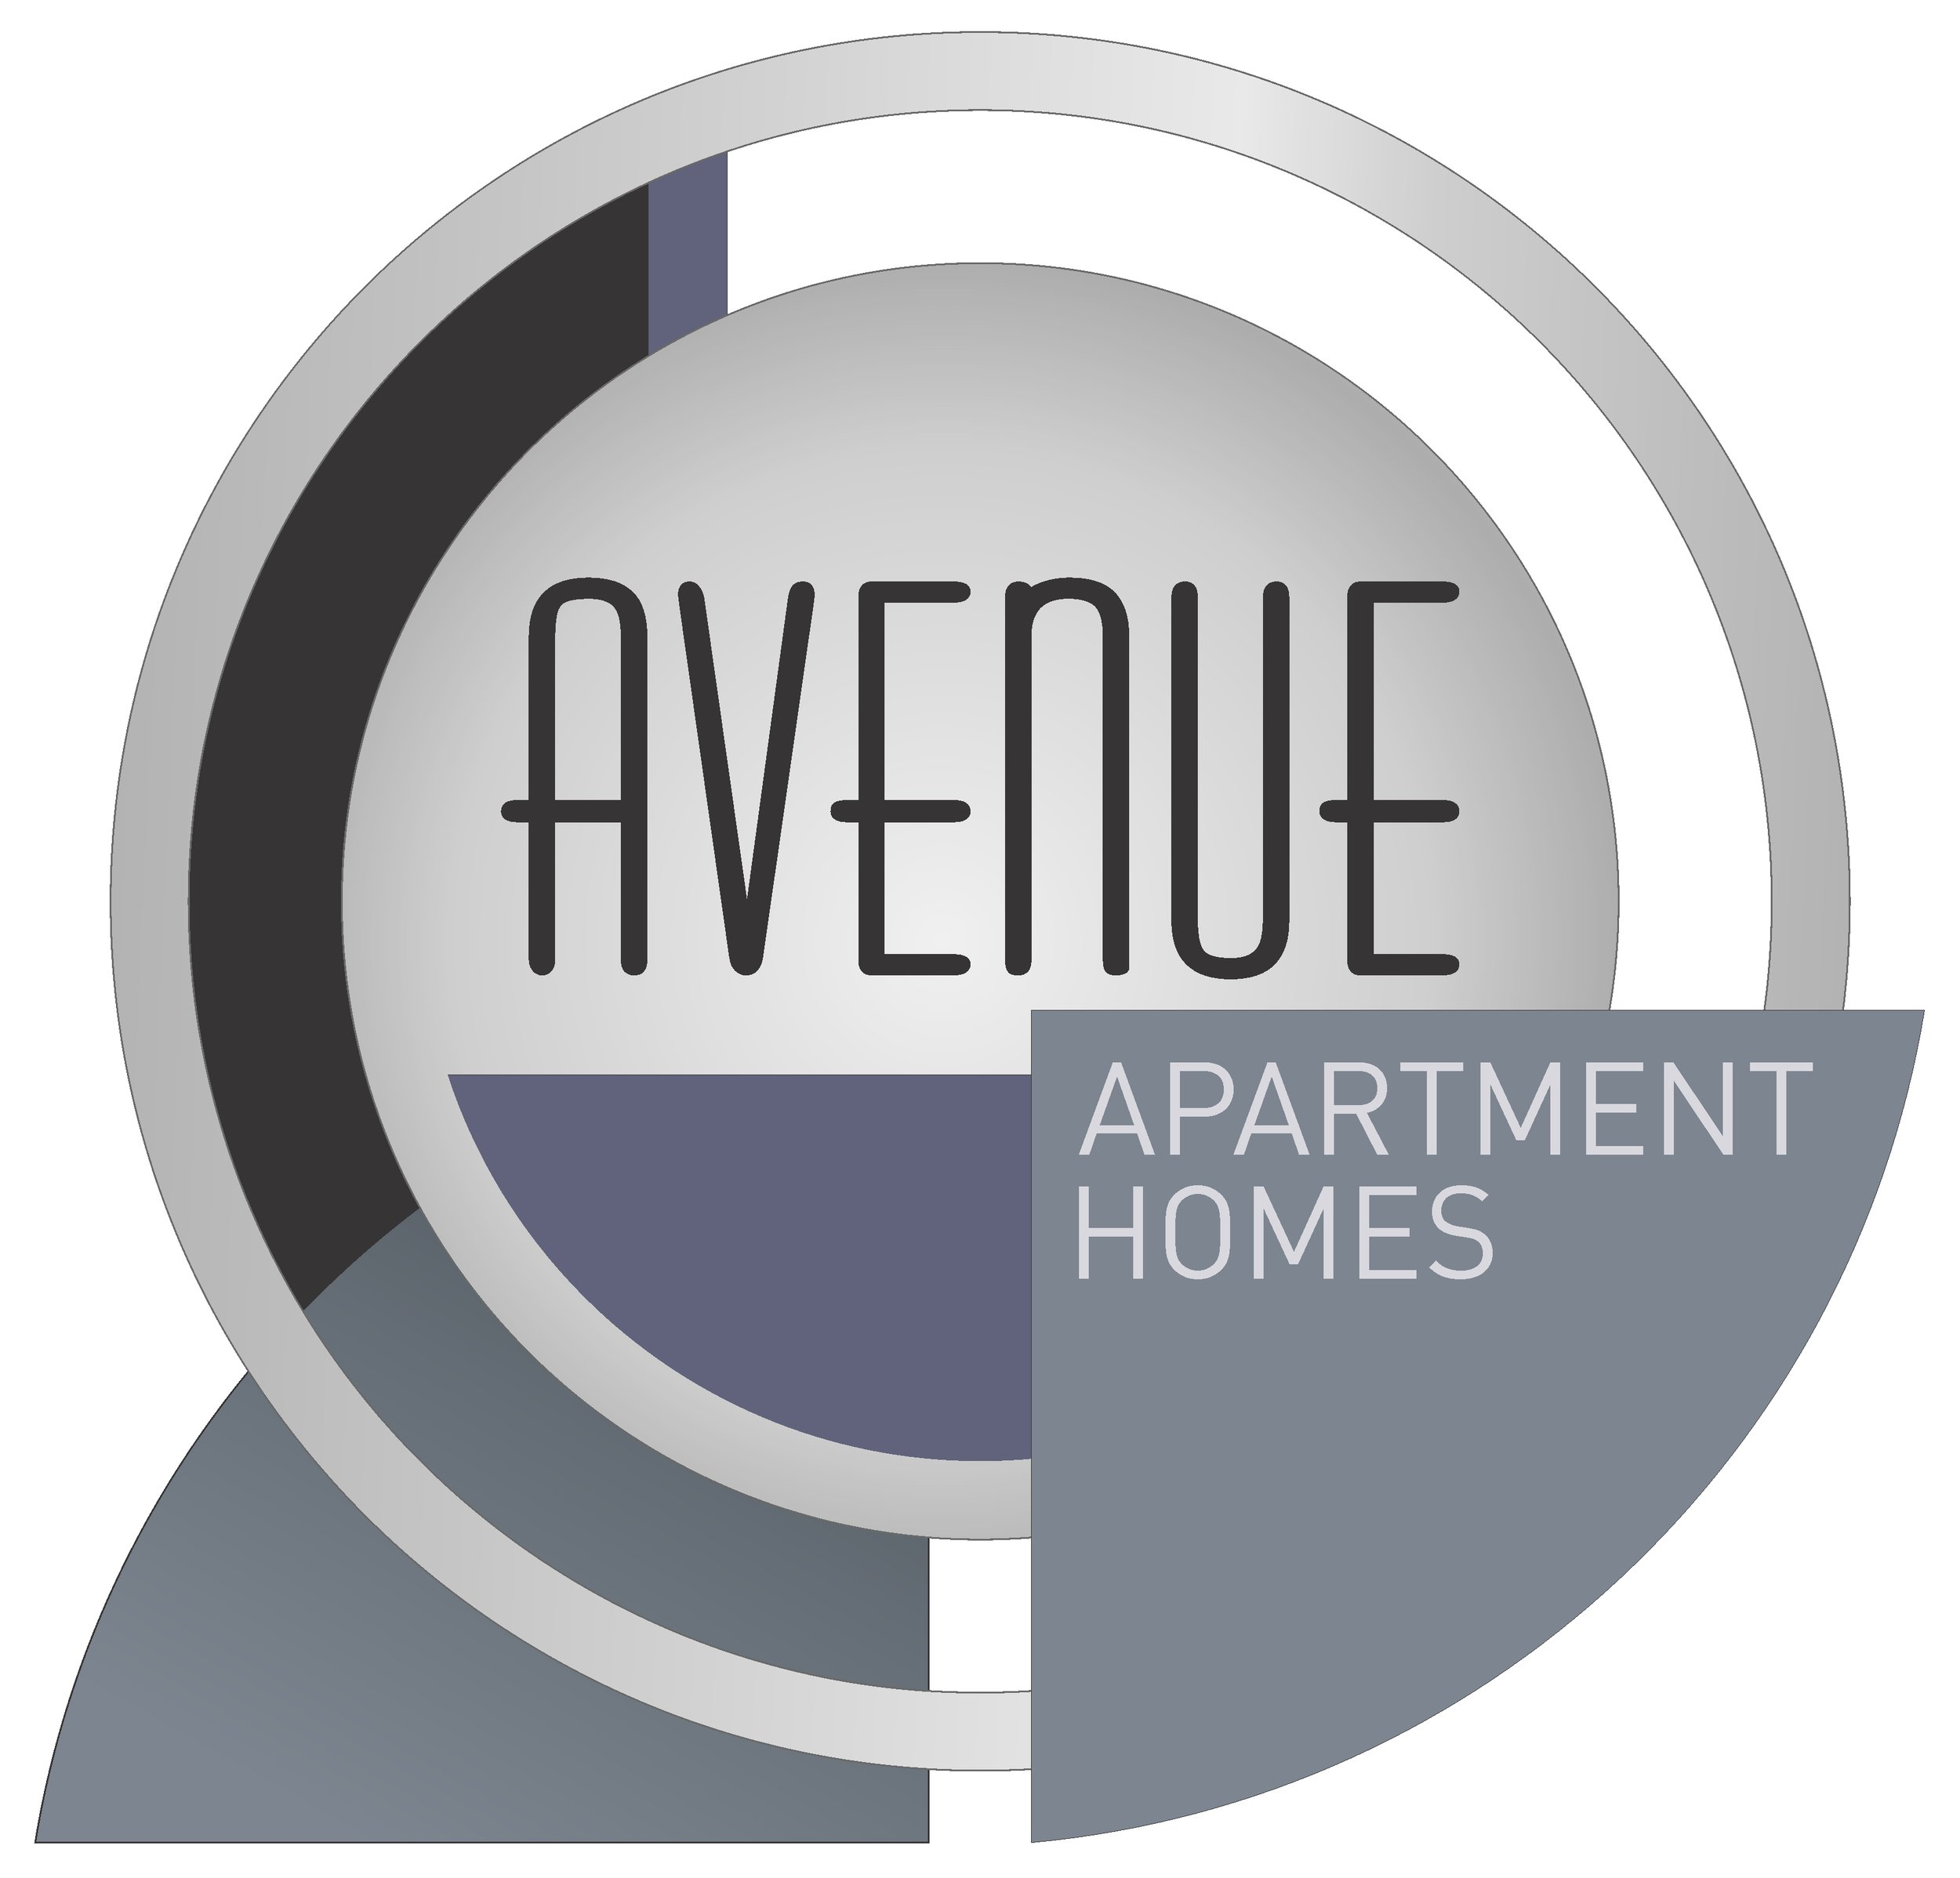 avenue1.jpg